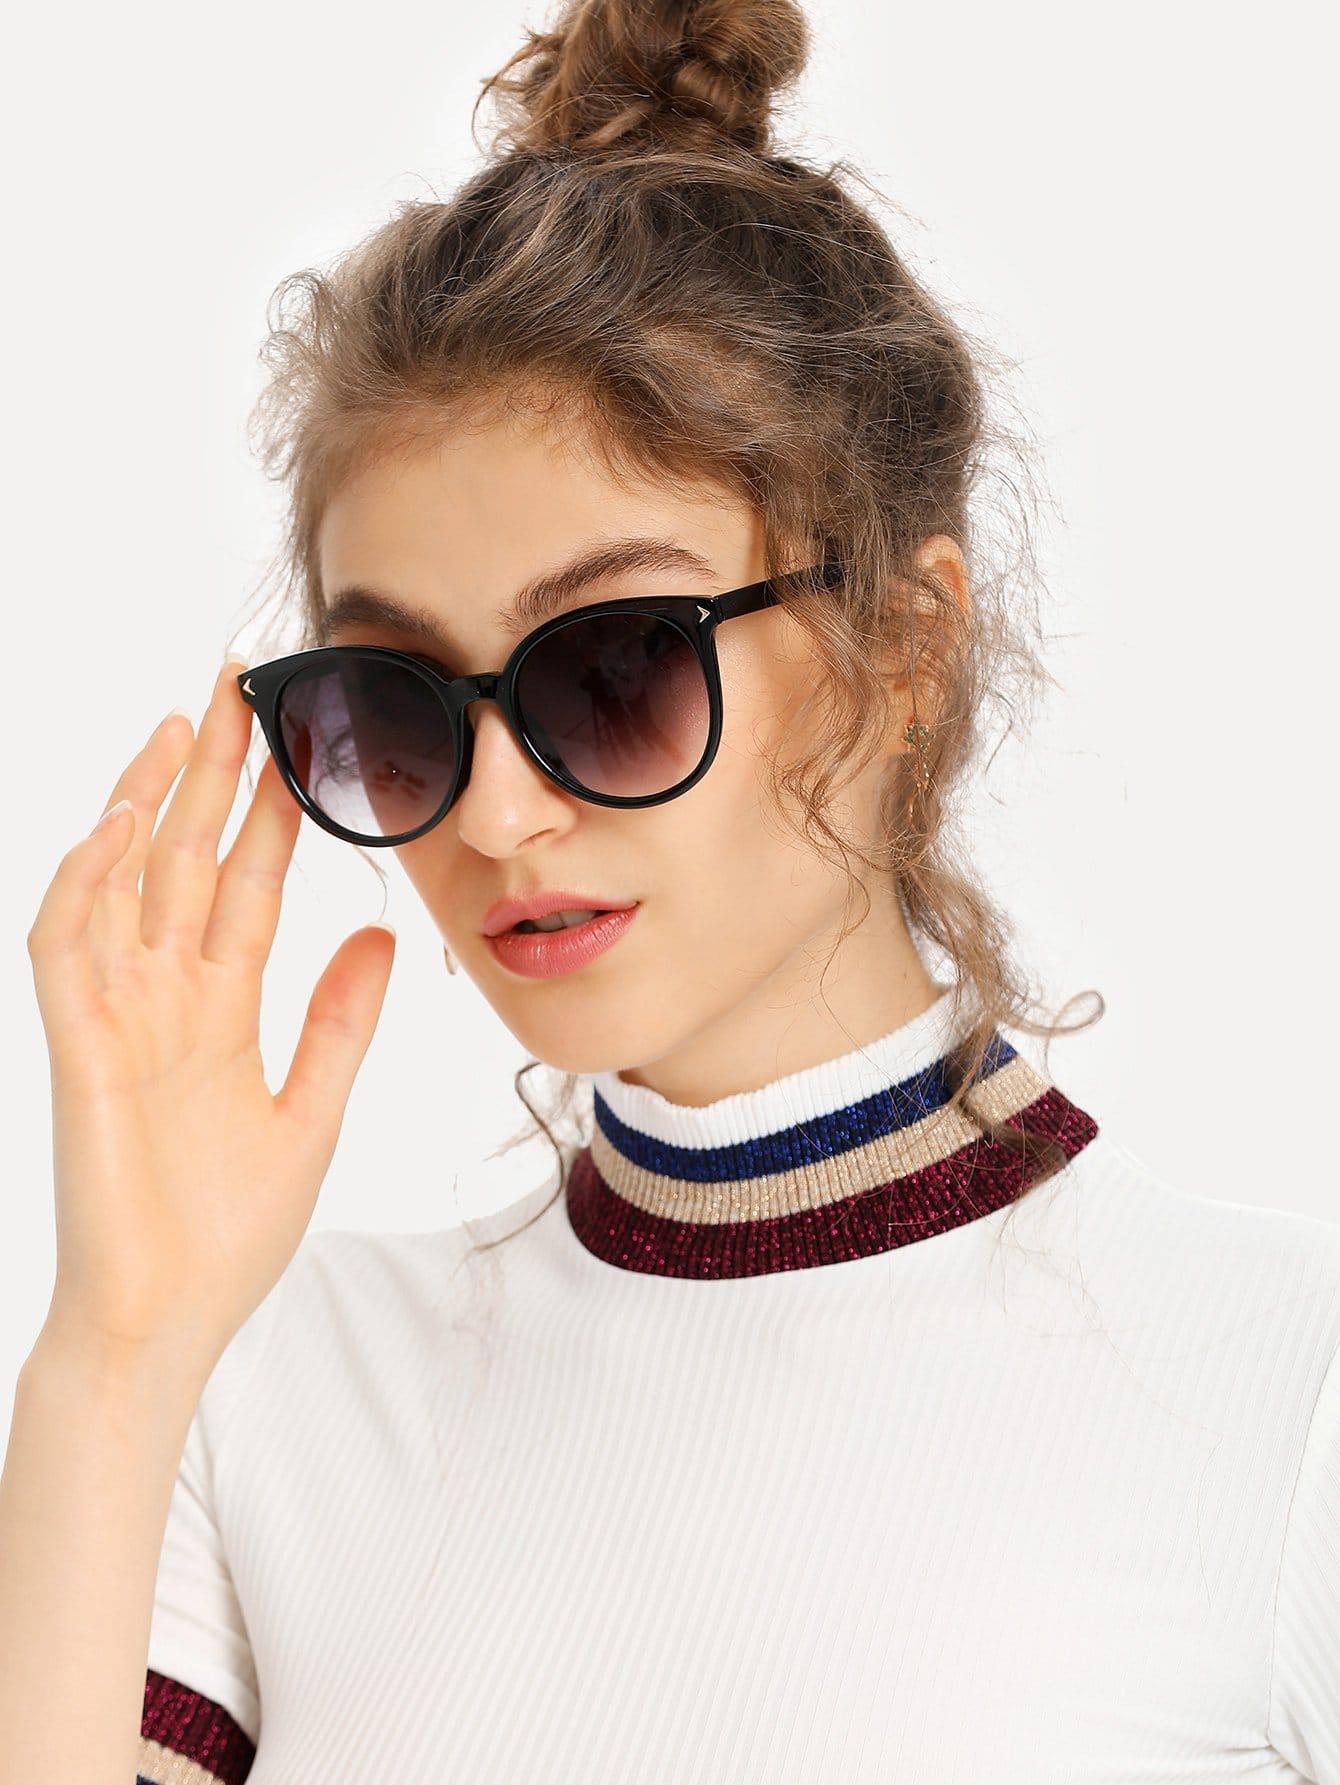 Mirror Lens Cat Eye Sunglasses cat eye glasses tinize 2015 tr90 5832